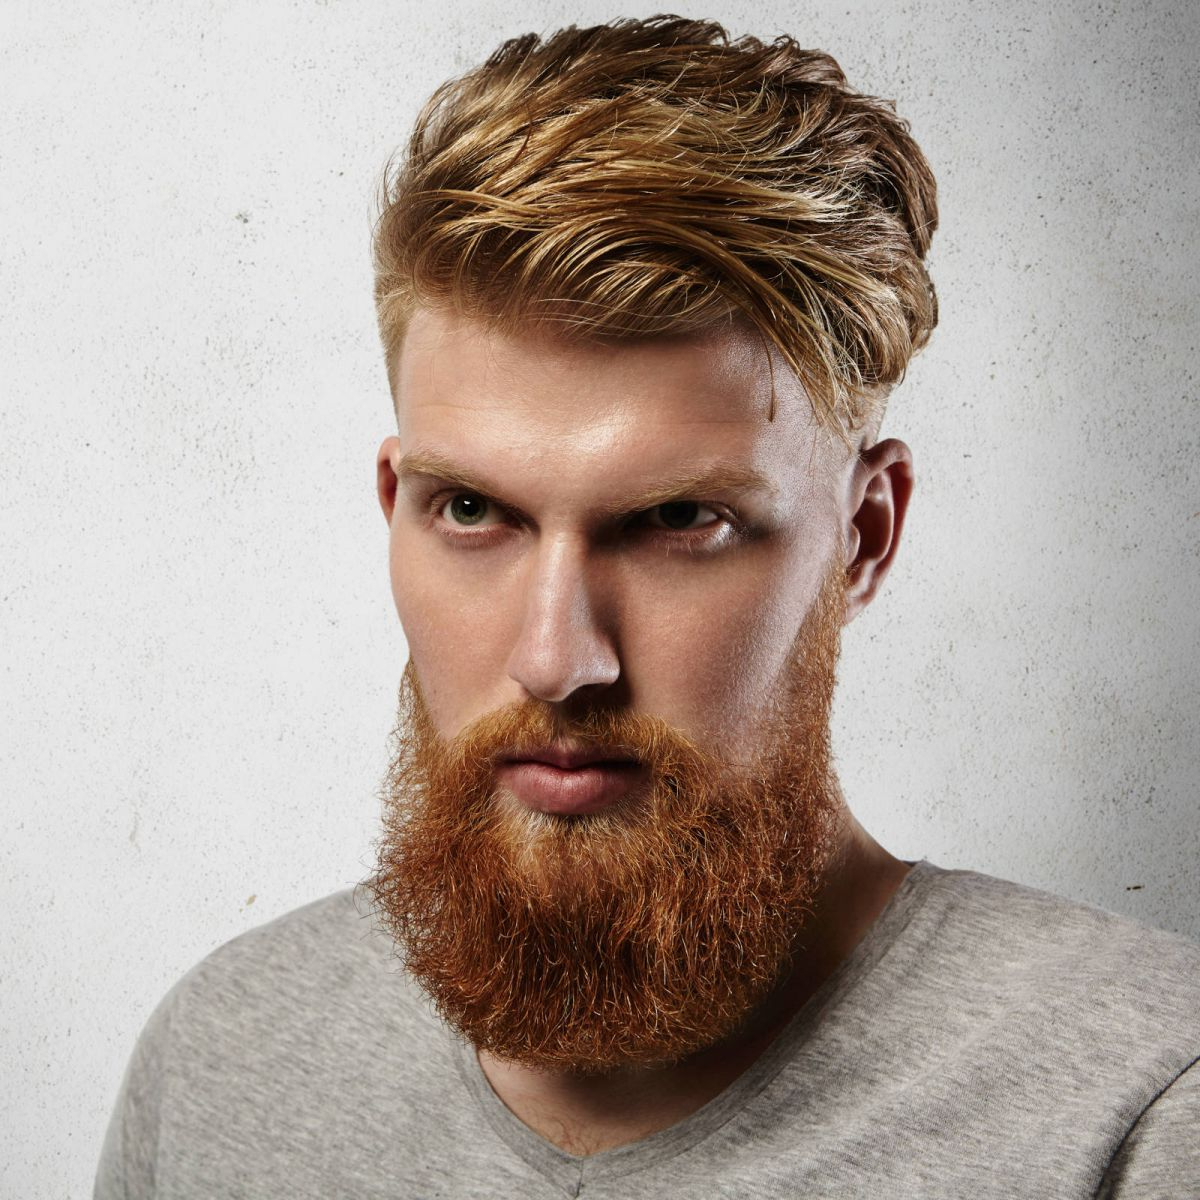 21 Eye Catching Red Hair Men's Hairstyles (Ginger Hairstyles) Within Short Hairstyles For Red Hair (View 18 of 25)